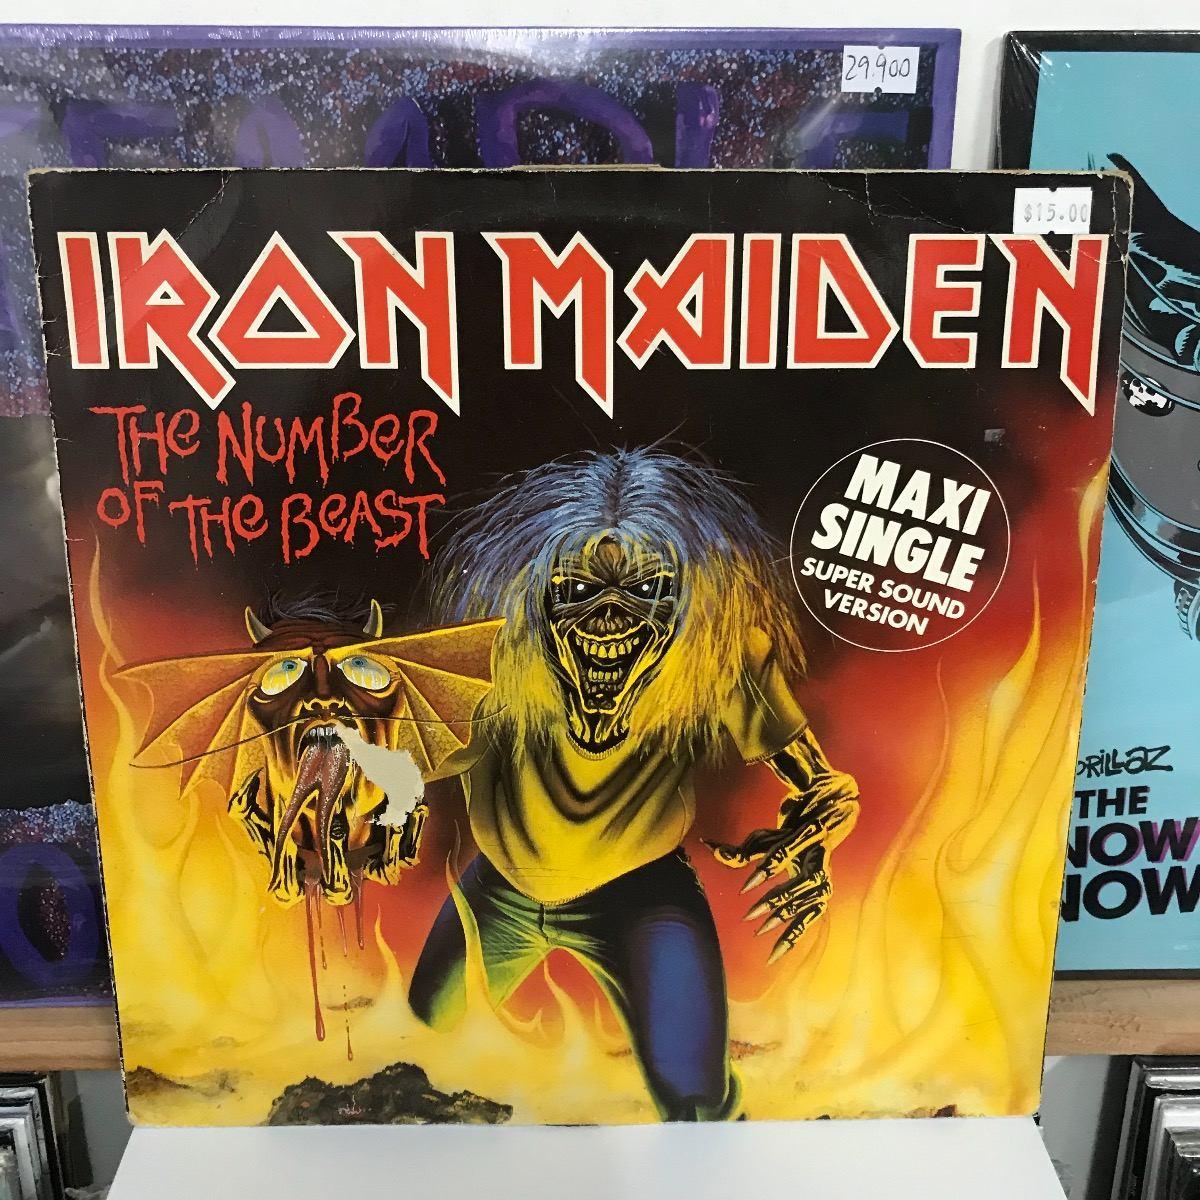 iron maiden the number of the beast vinilo musicovinyl 19 900 en